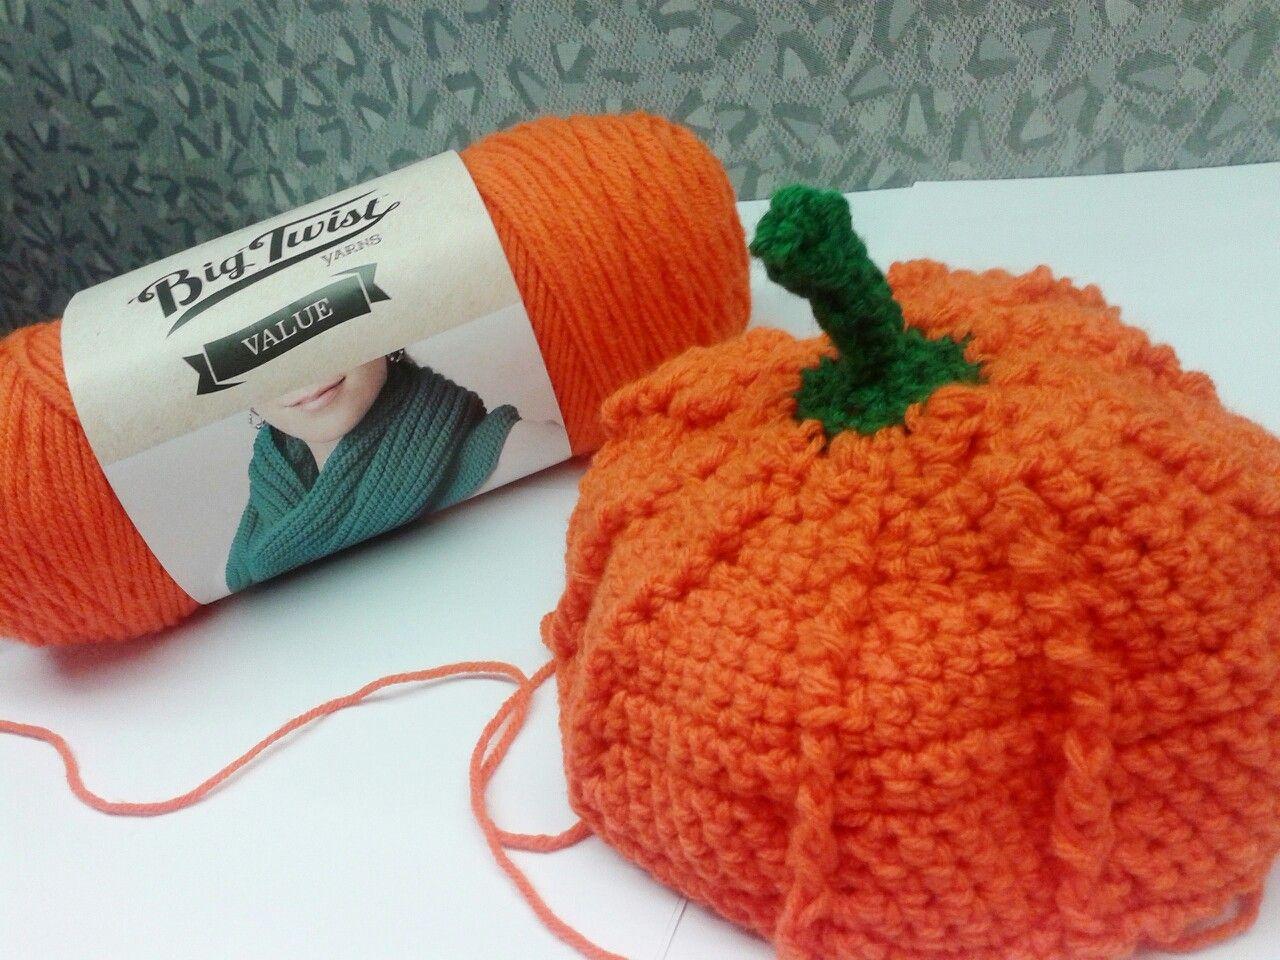 Joann Fabric's Big Twist Yarn : crochet